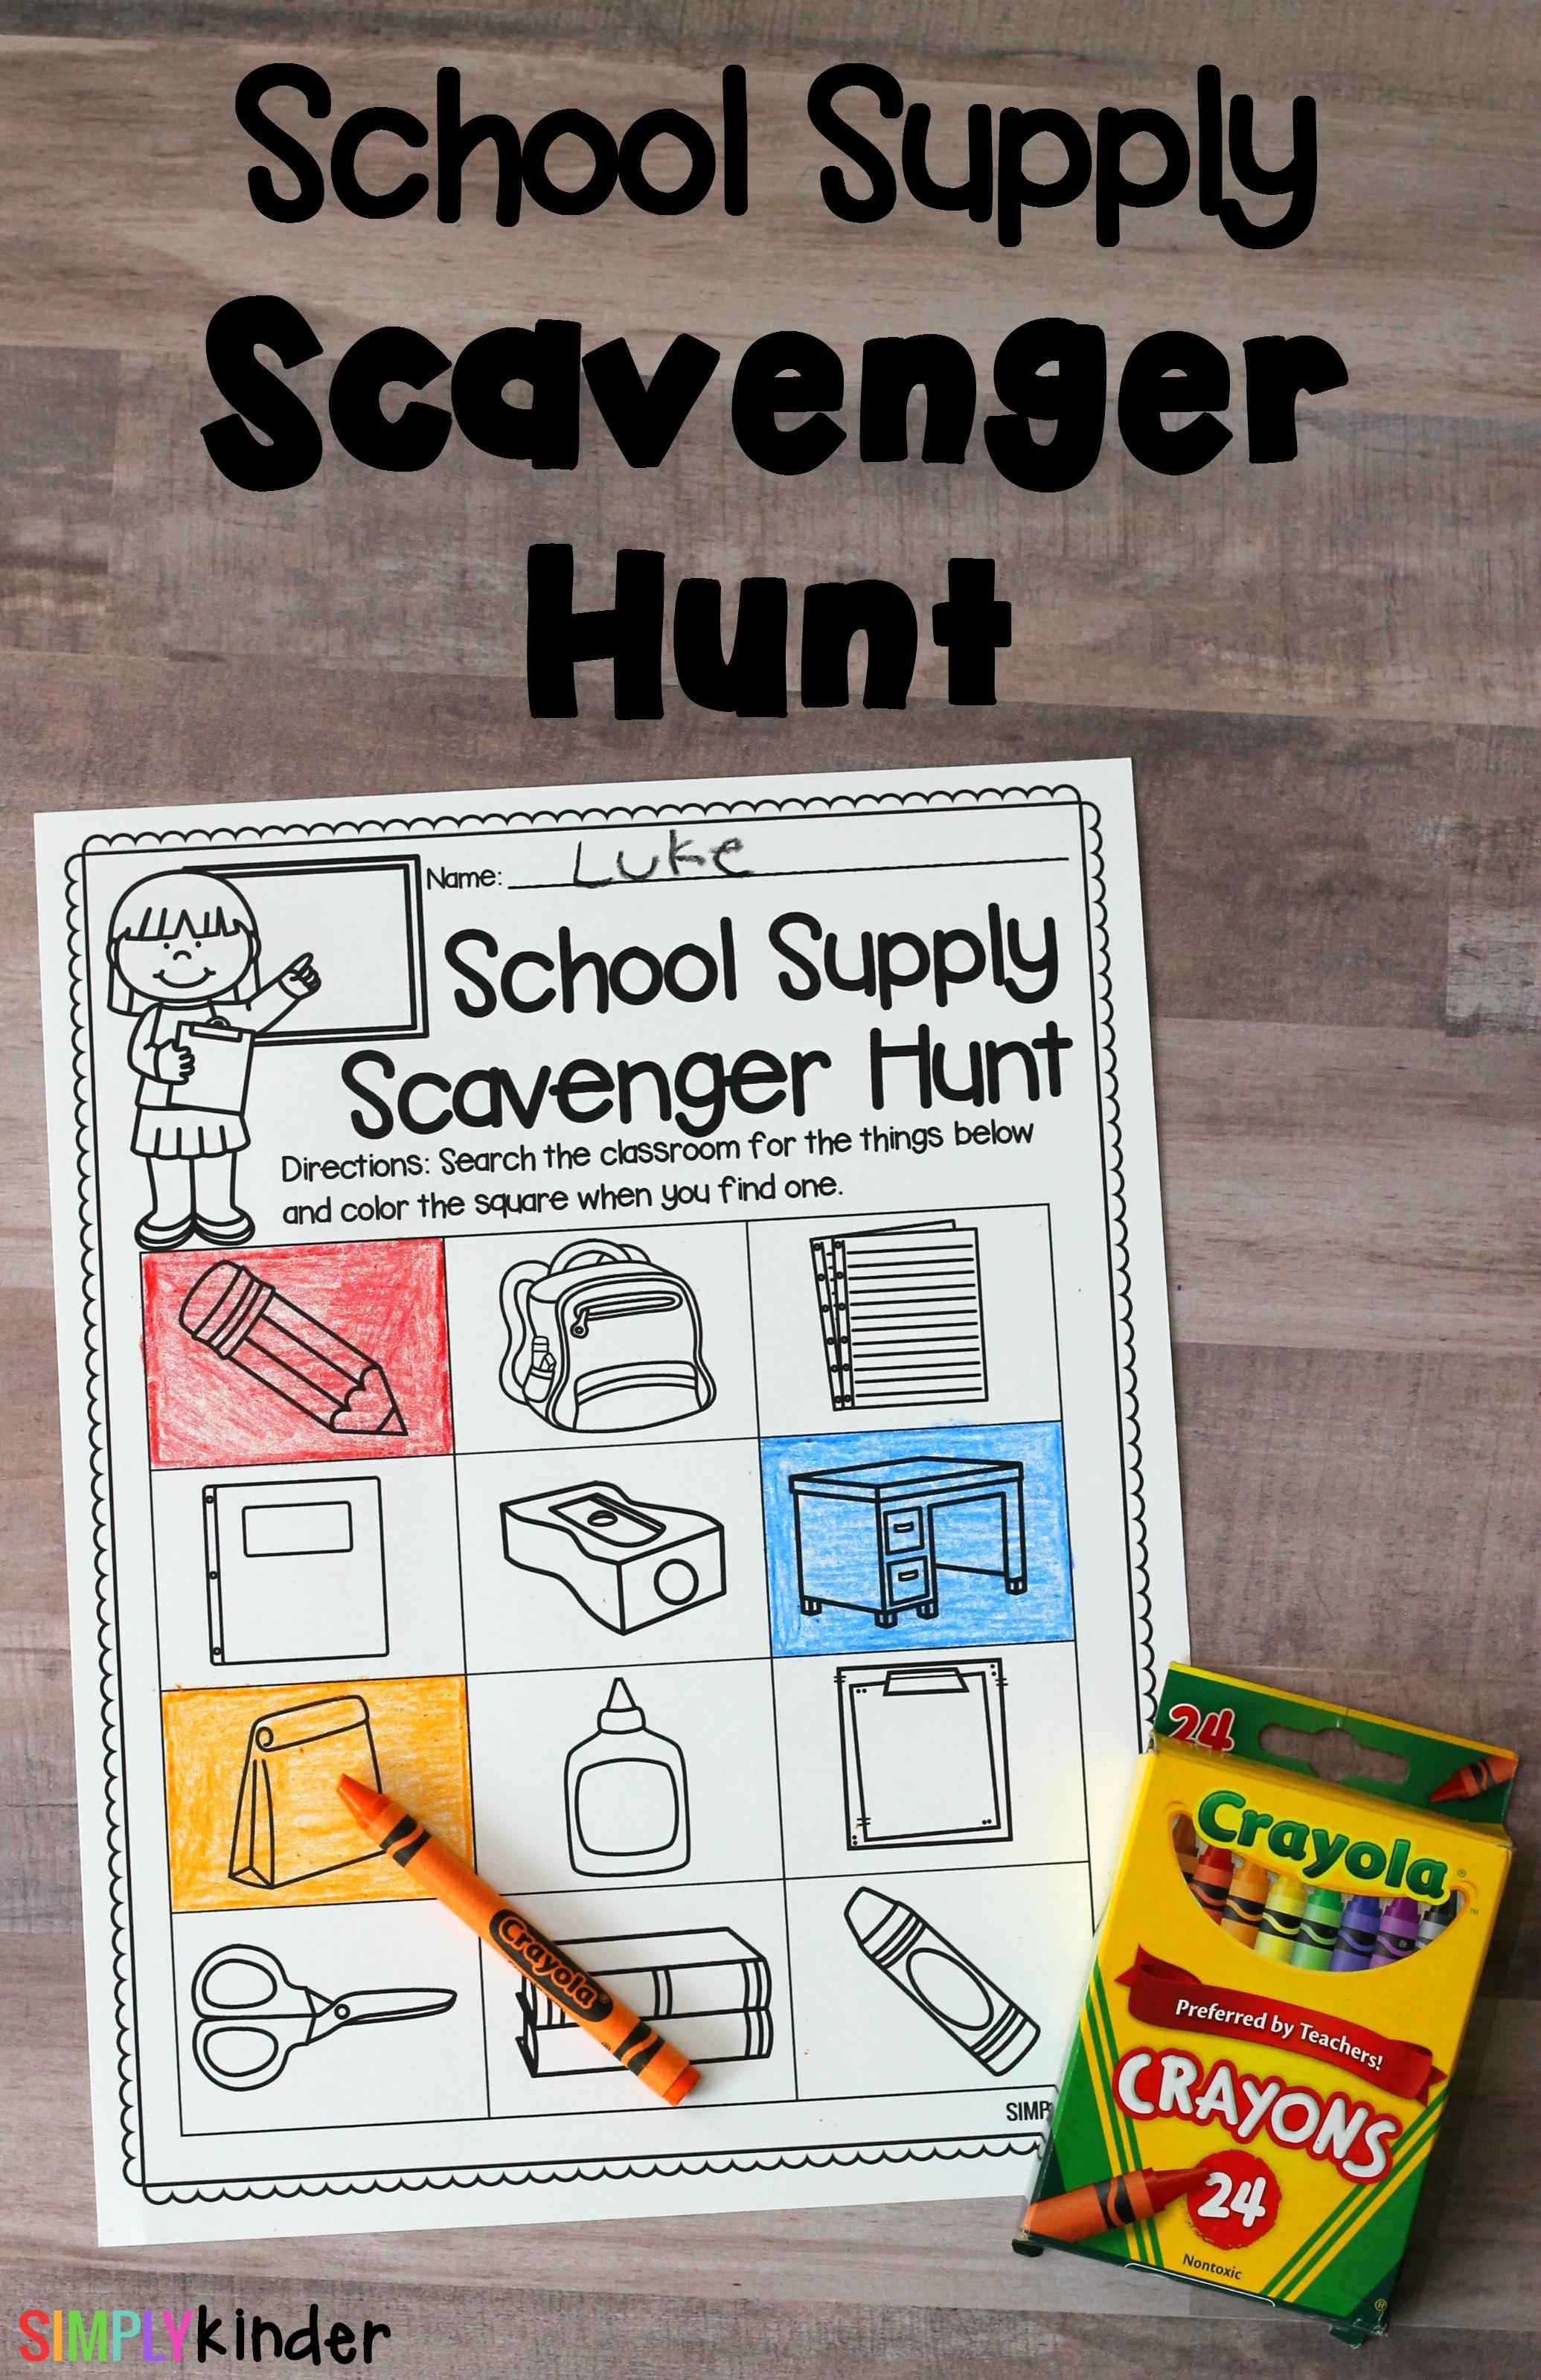 school supply scavenger hunt, back to school activity, first day of school activity, back to school scavenger hunt